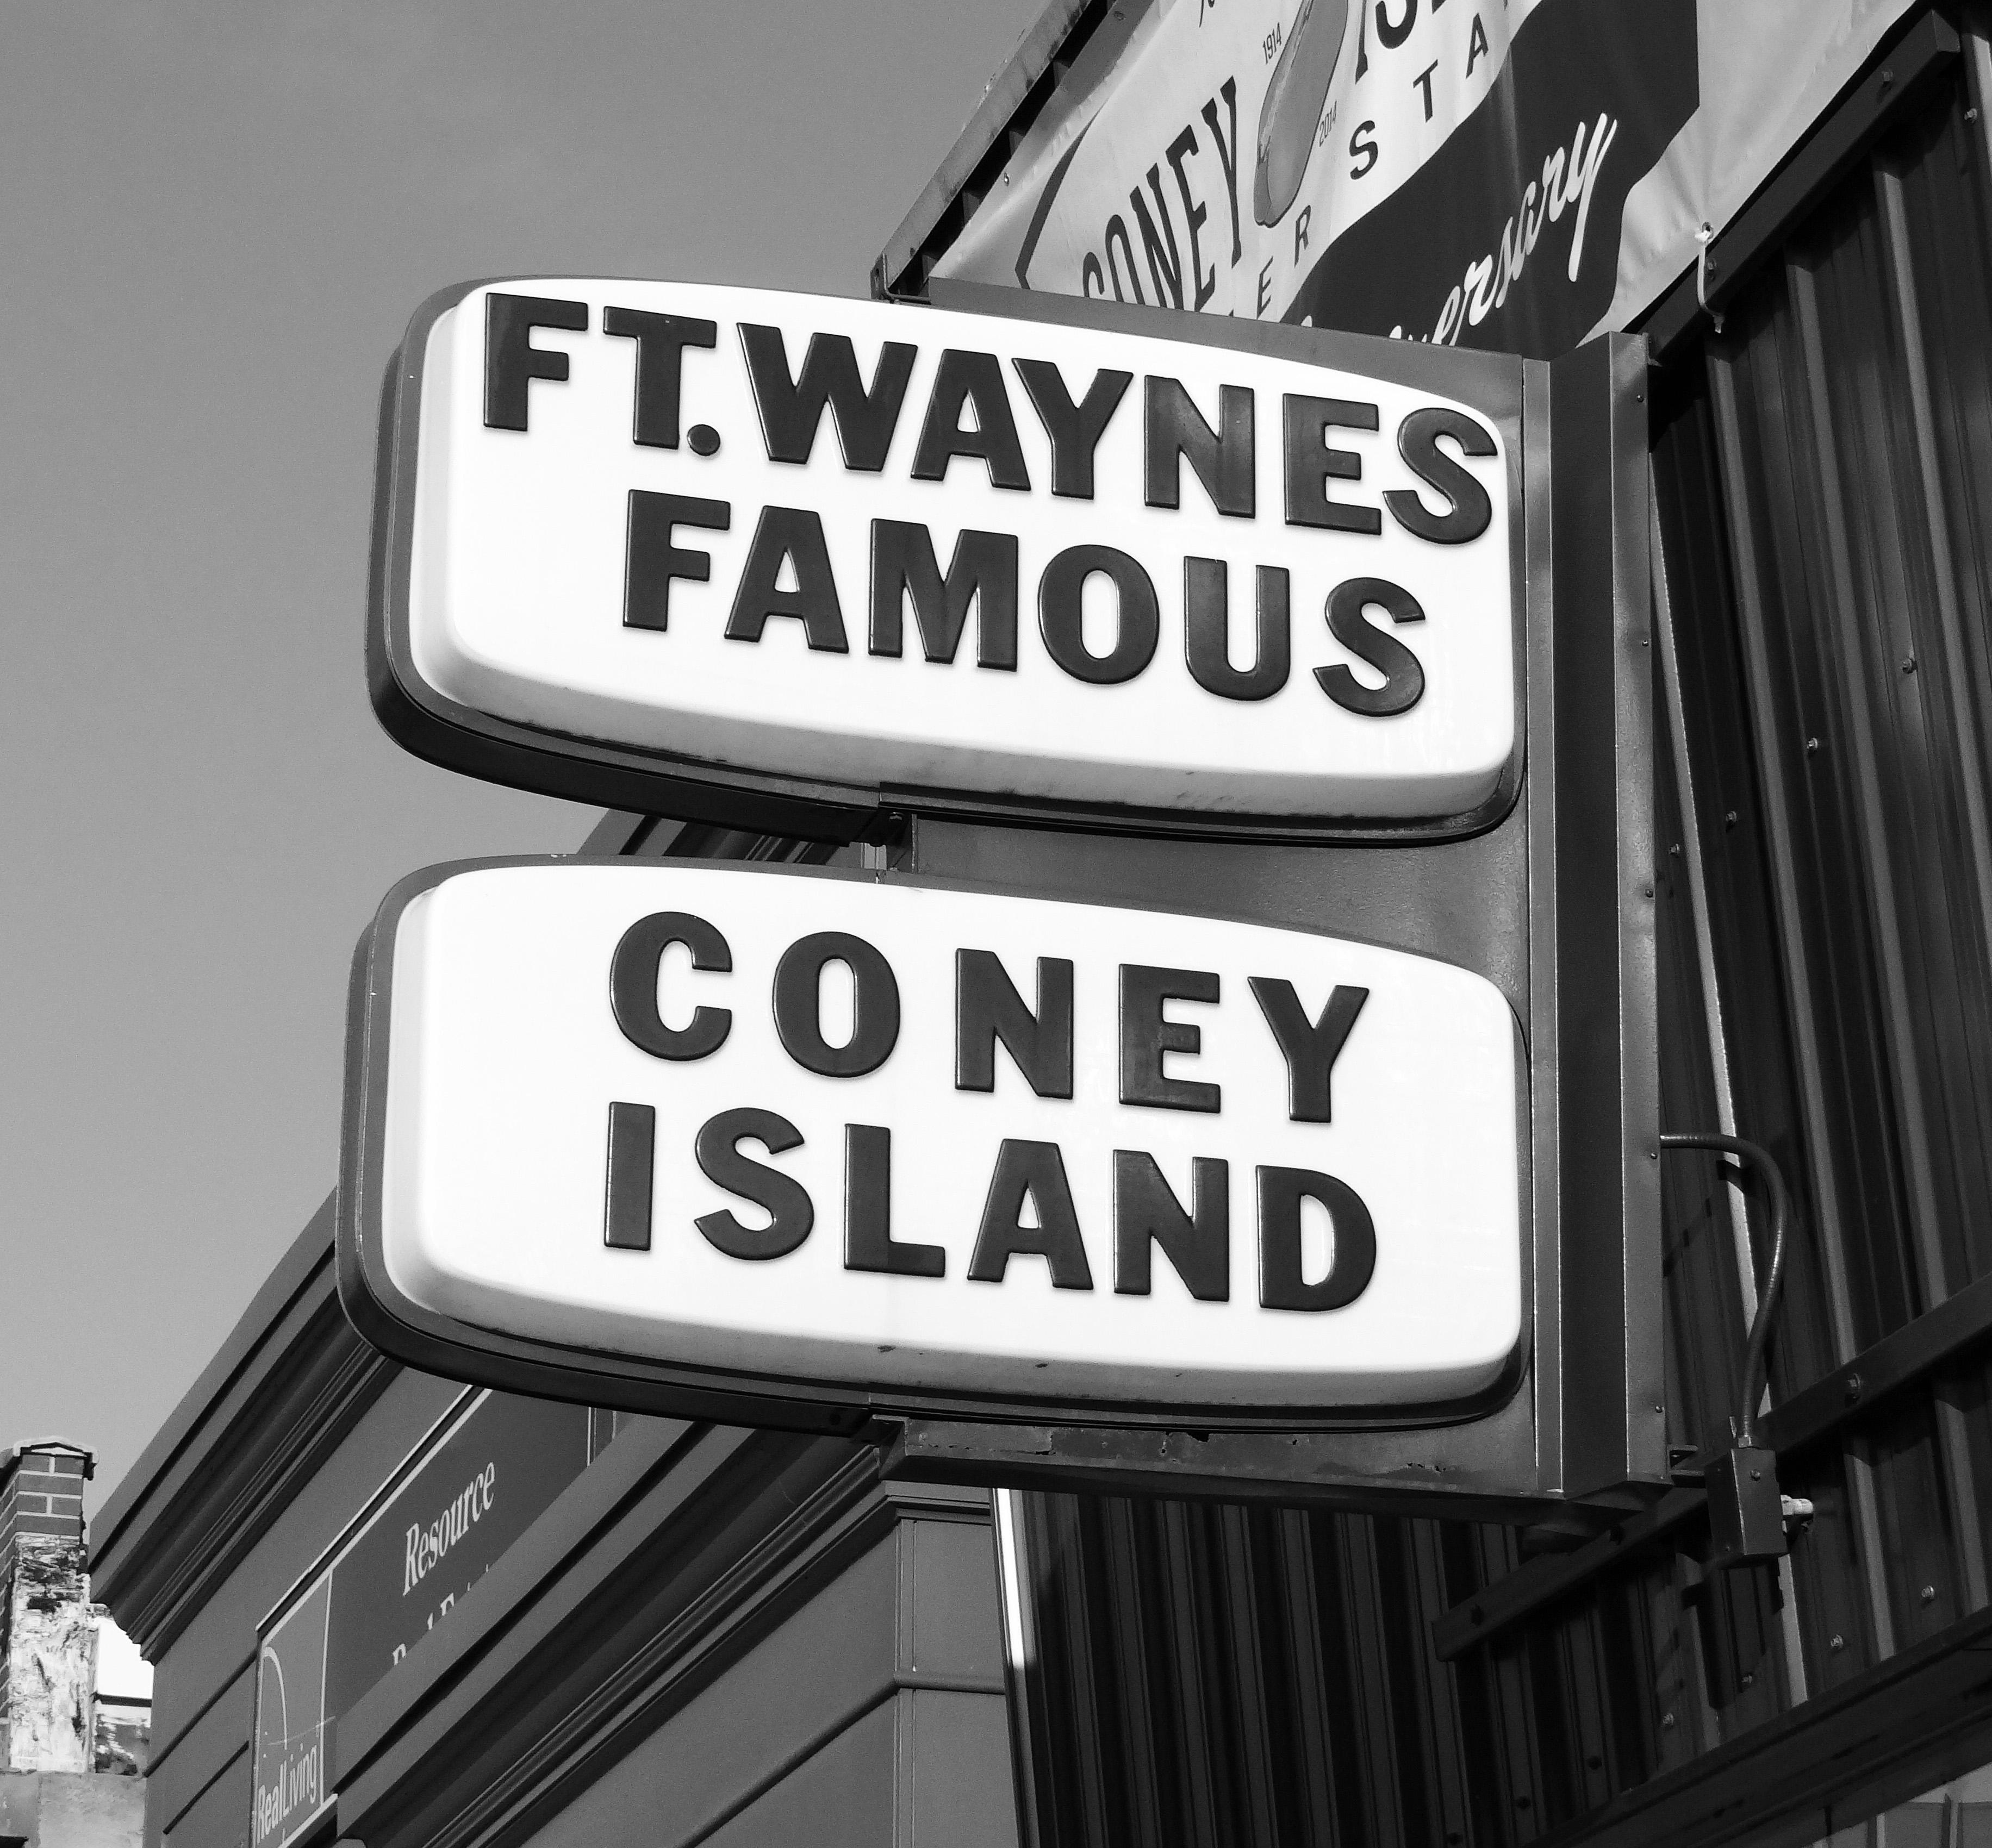 Coney Island In Fort Wayne Indiana